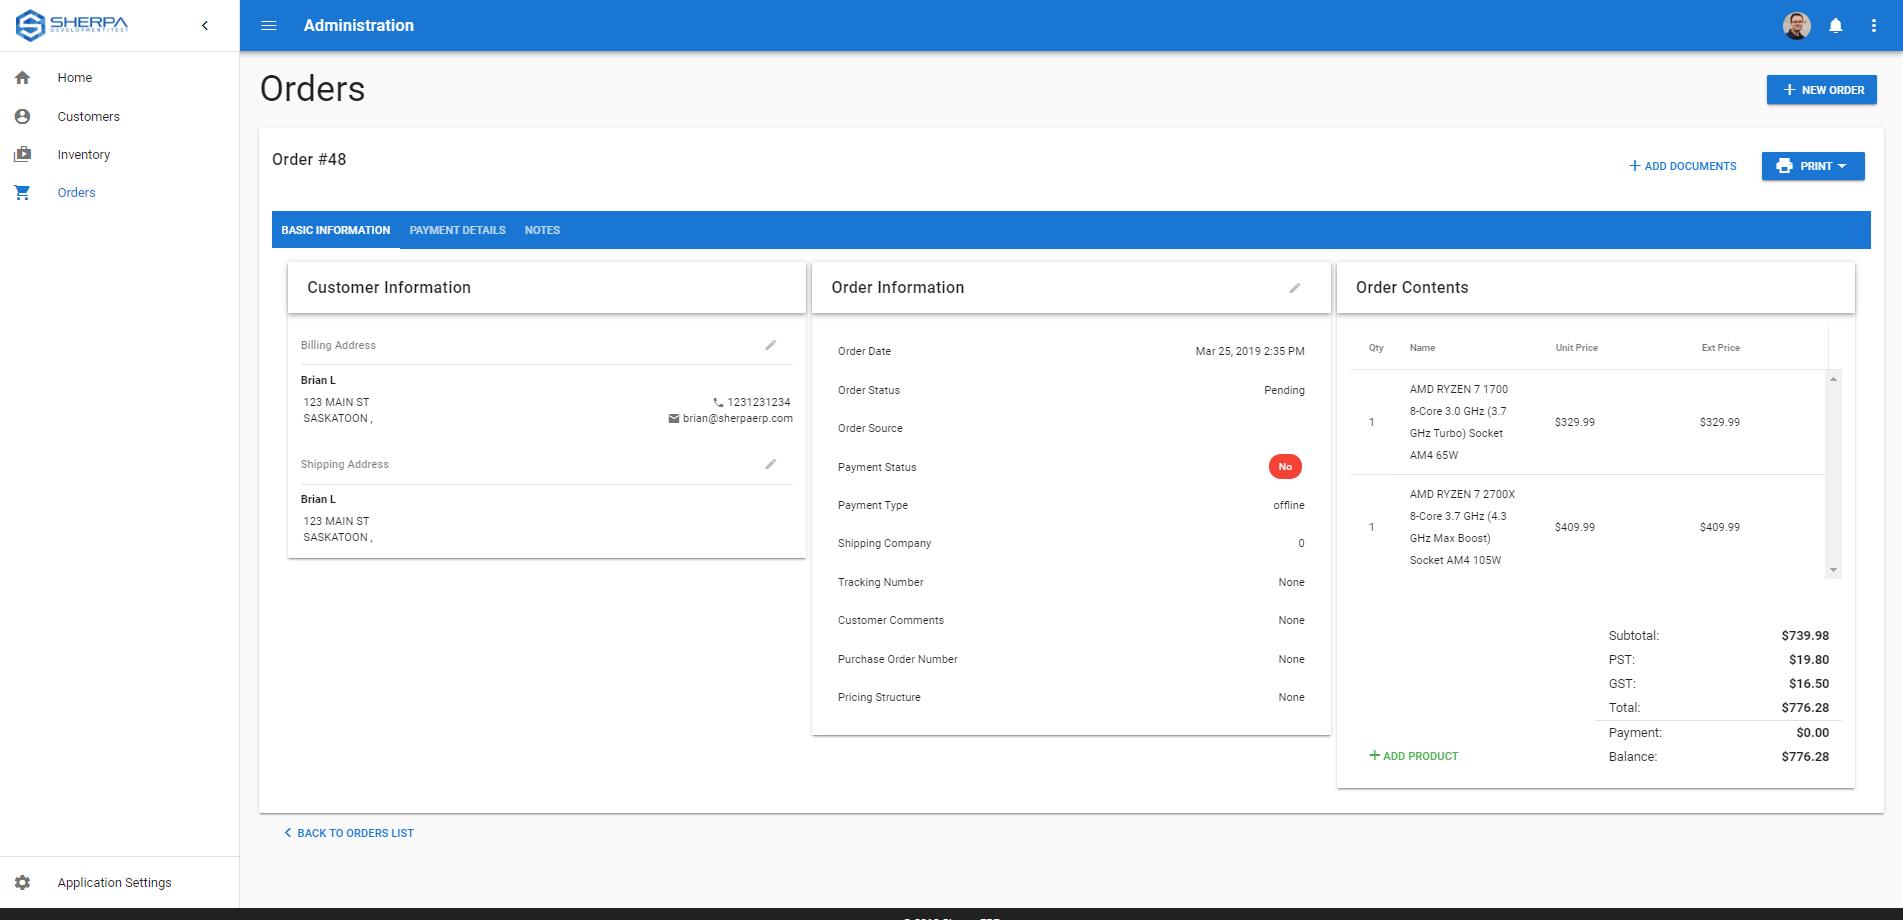 Sherpa ERP Software - Order management dashboard